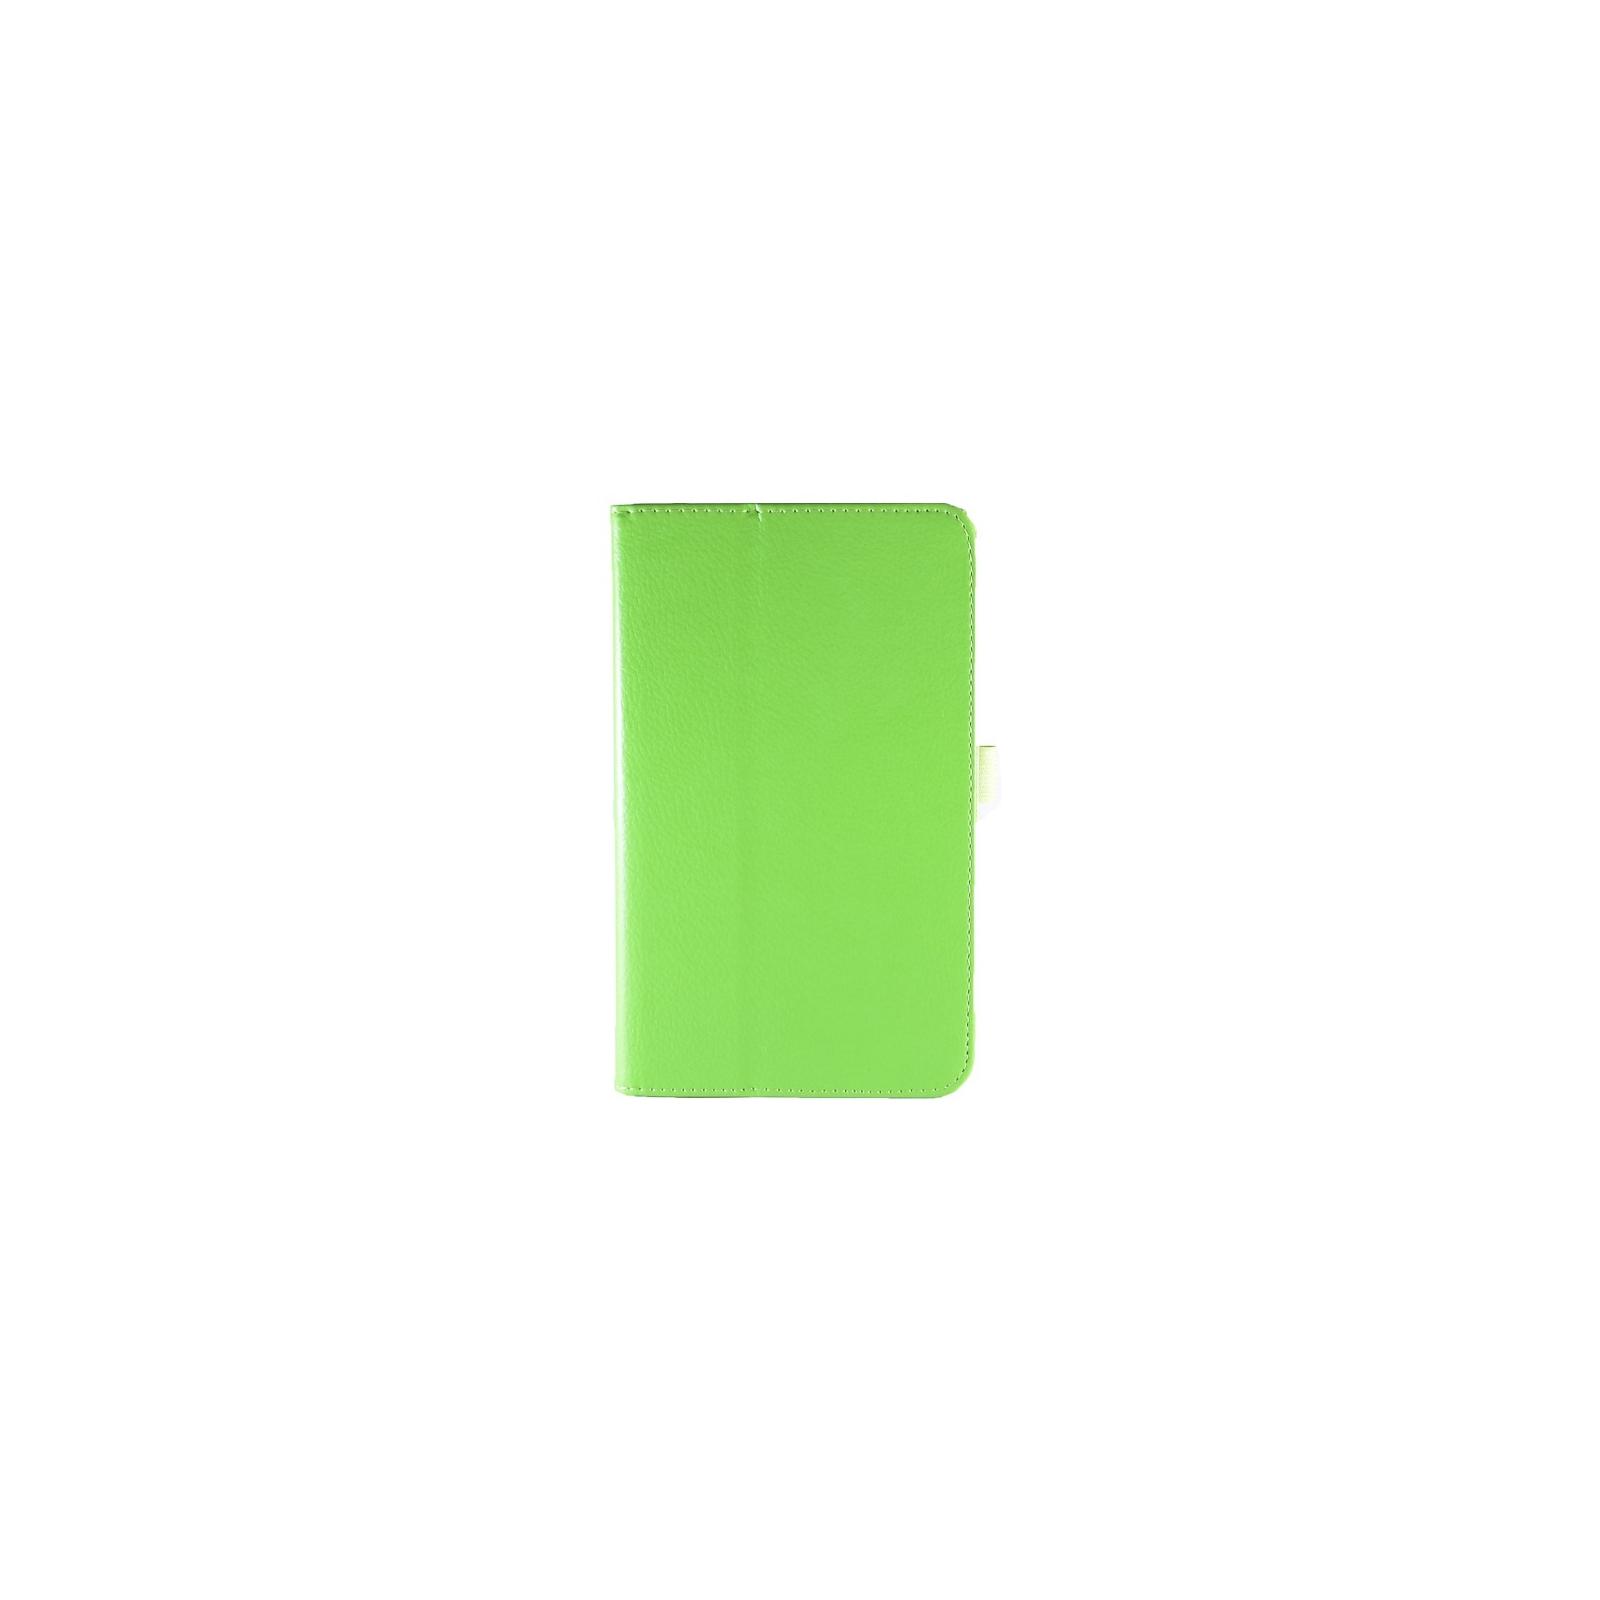 "Чехол для планшета Pro-case 7"" Asus MeMO Pad ME170 green (ME170gr)"